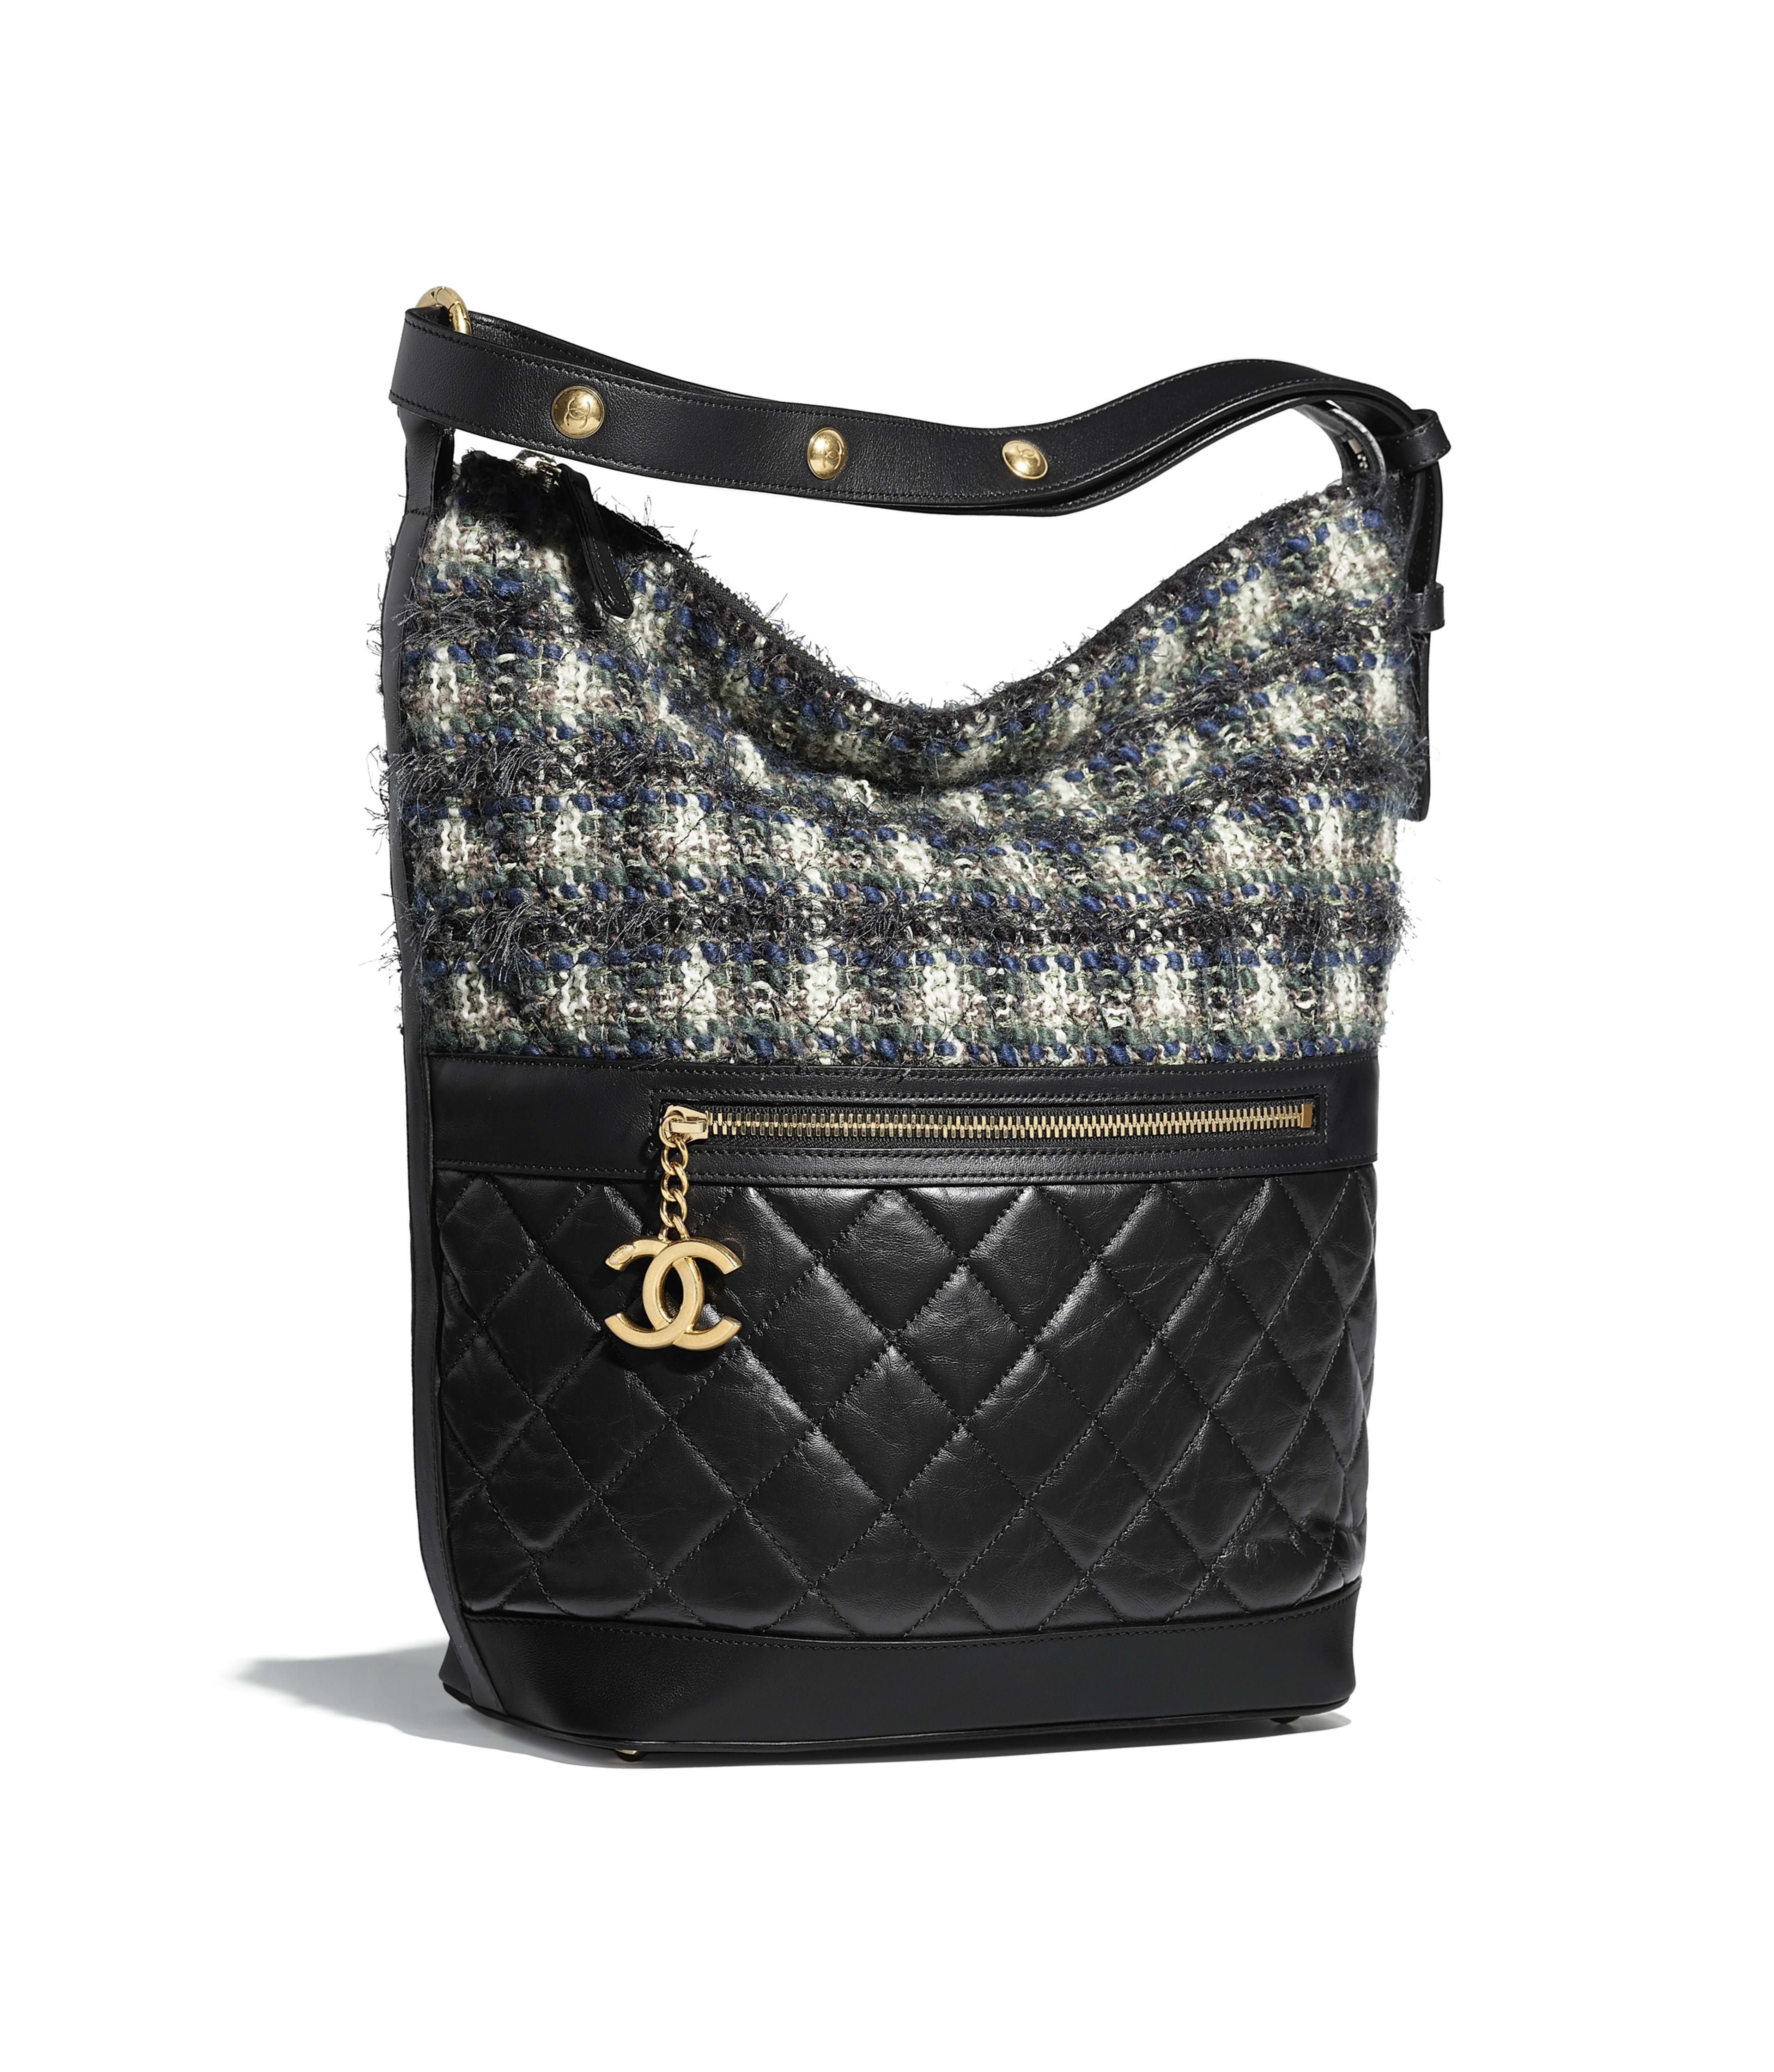 Hobo Handbag Aged Calfskin Tweed Gold Tone Metal Black Blue Green Ecru Ref A57966y83980k1157